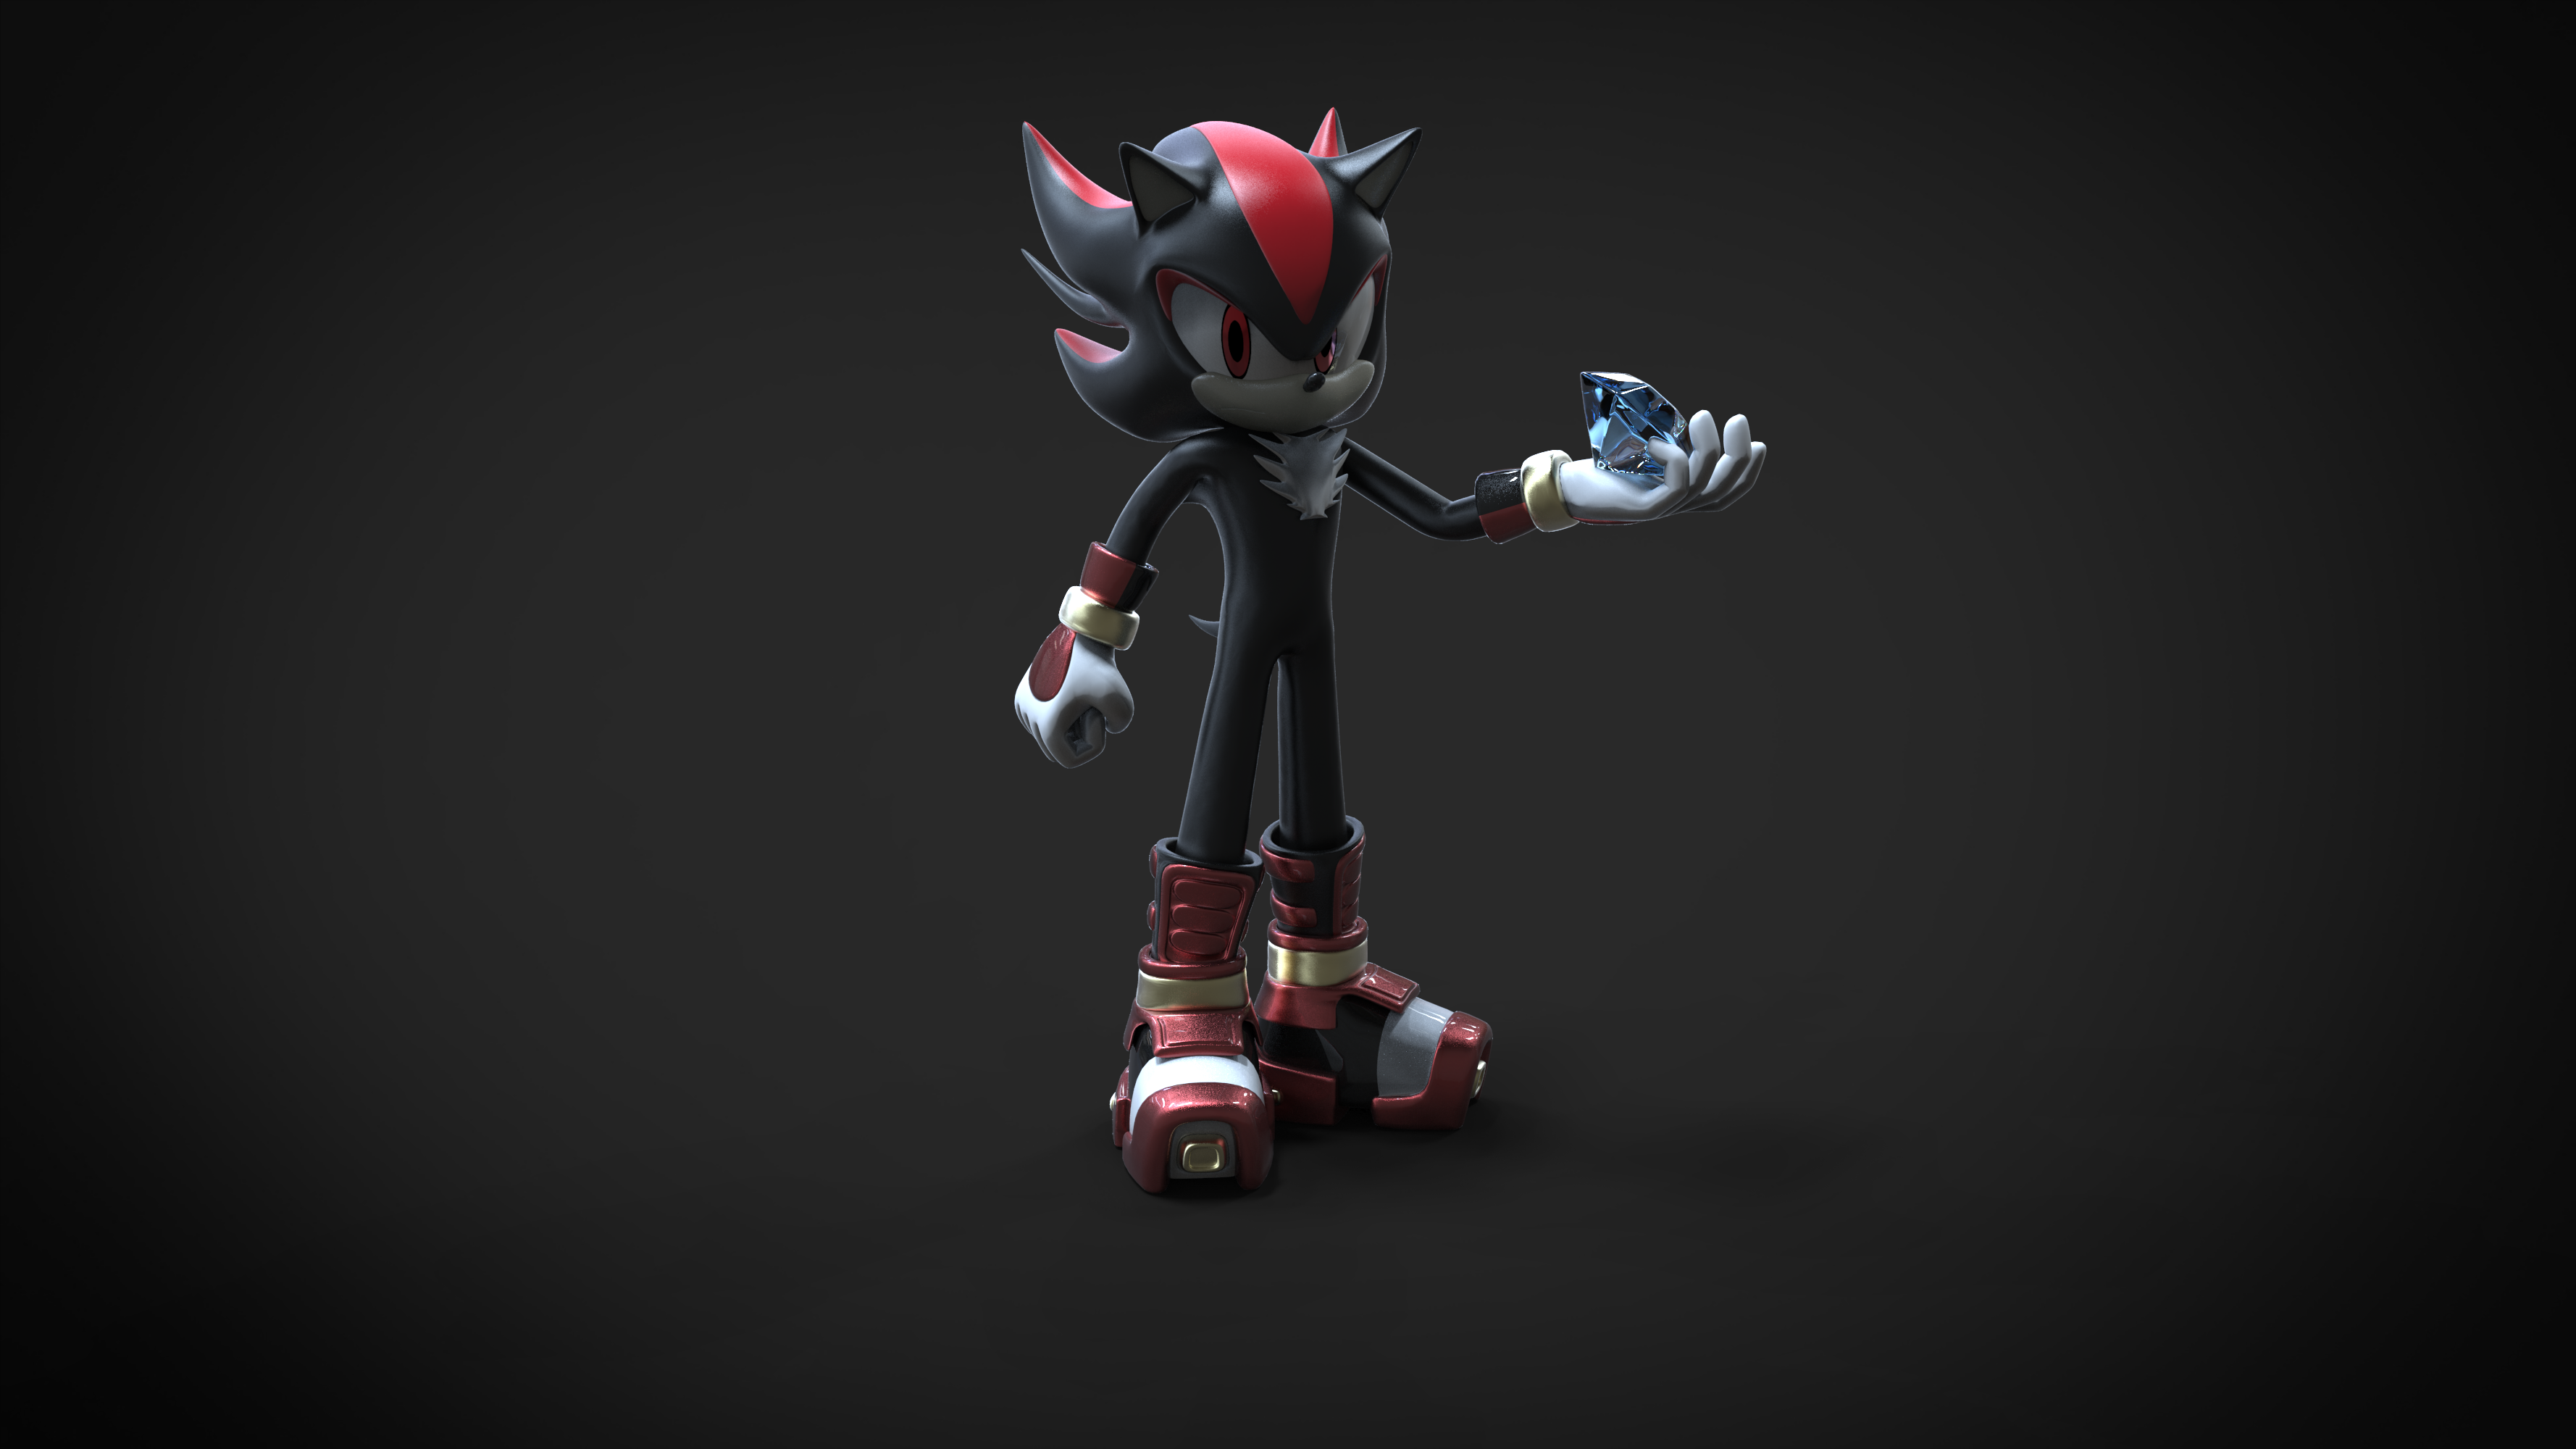 Sonic boom shadow the hedgehog by argos90 on deviantart - Shadow sonic boom ...